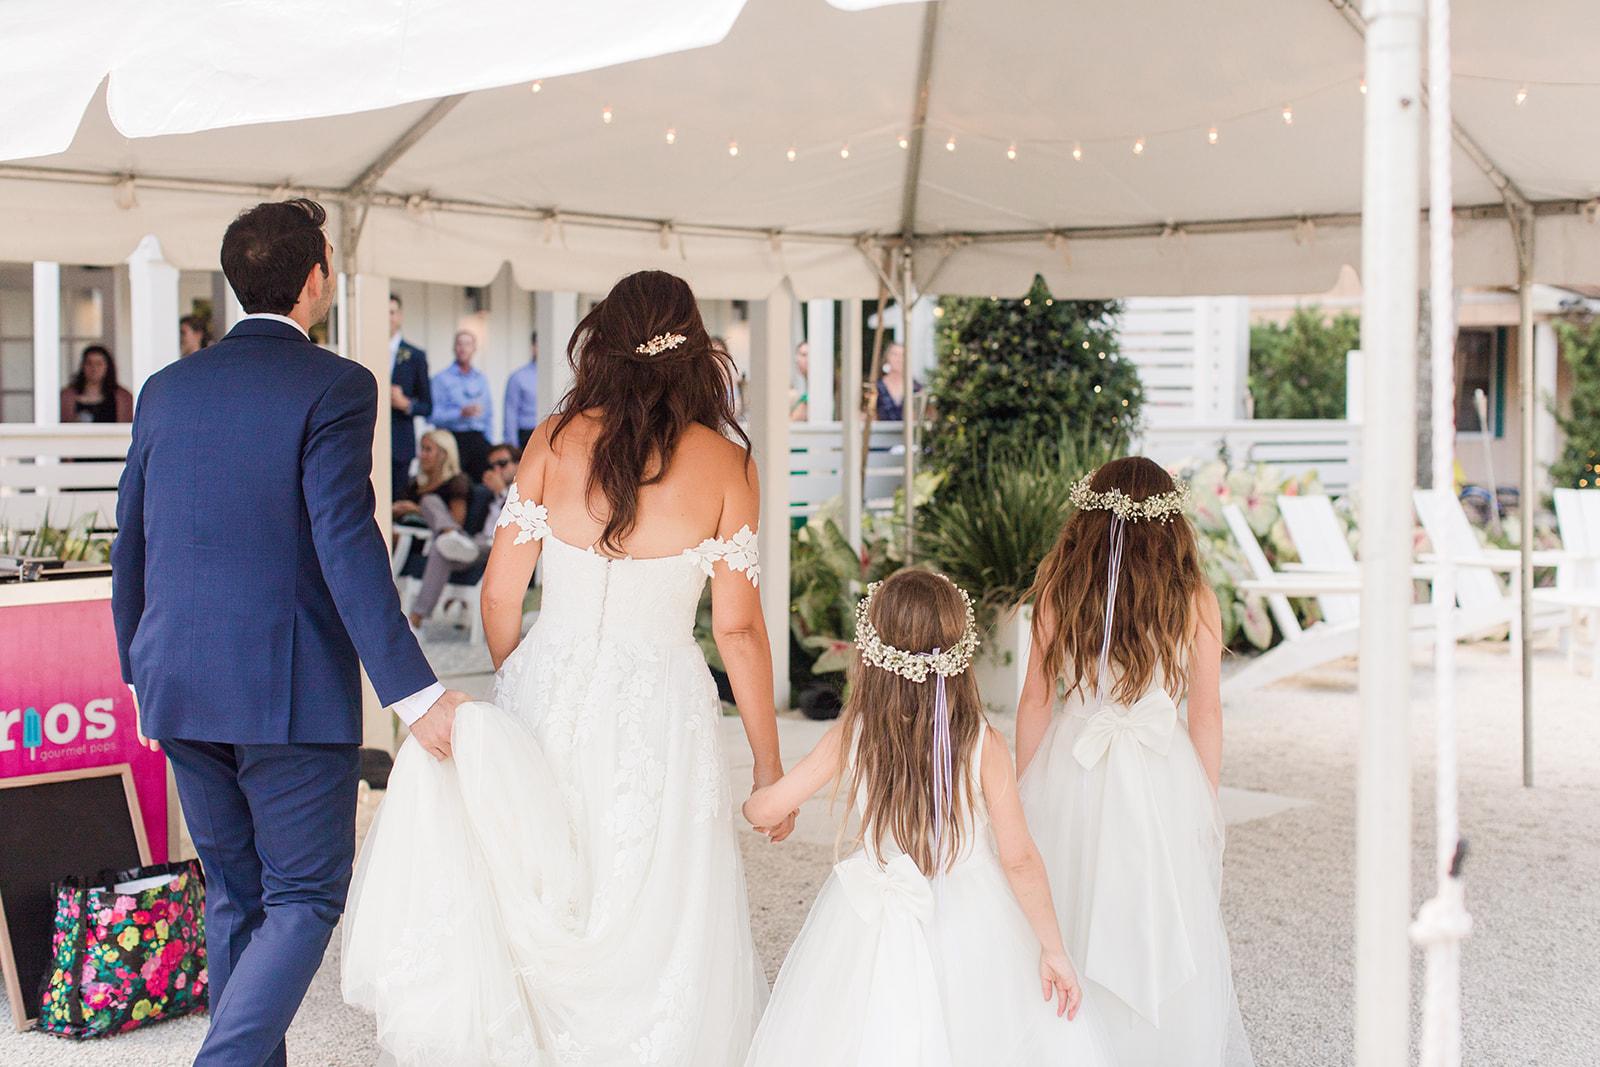 flower girls walk with bride into wedding reception